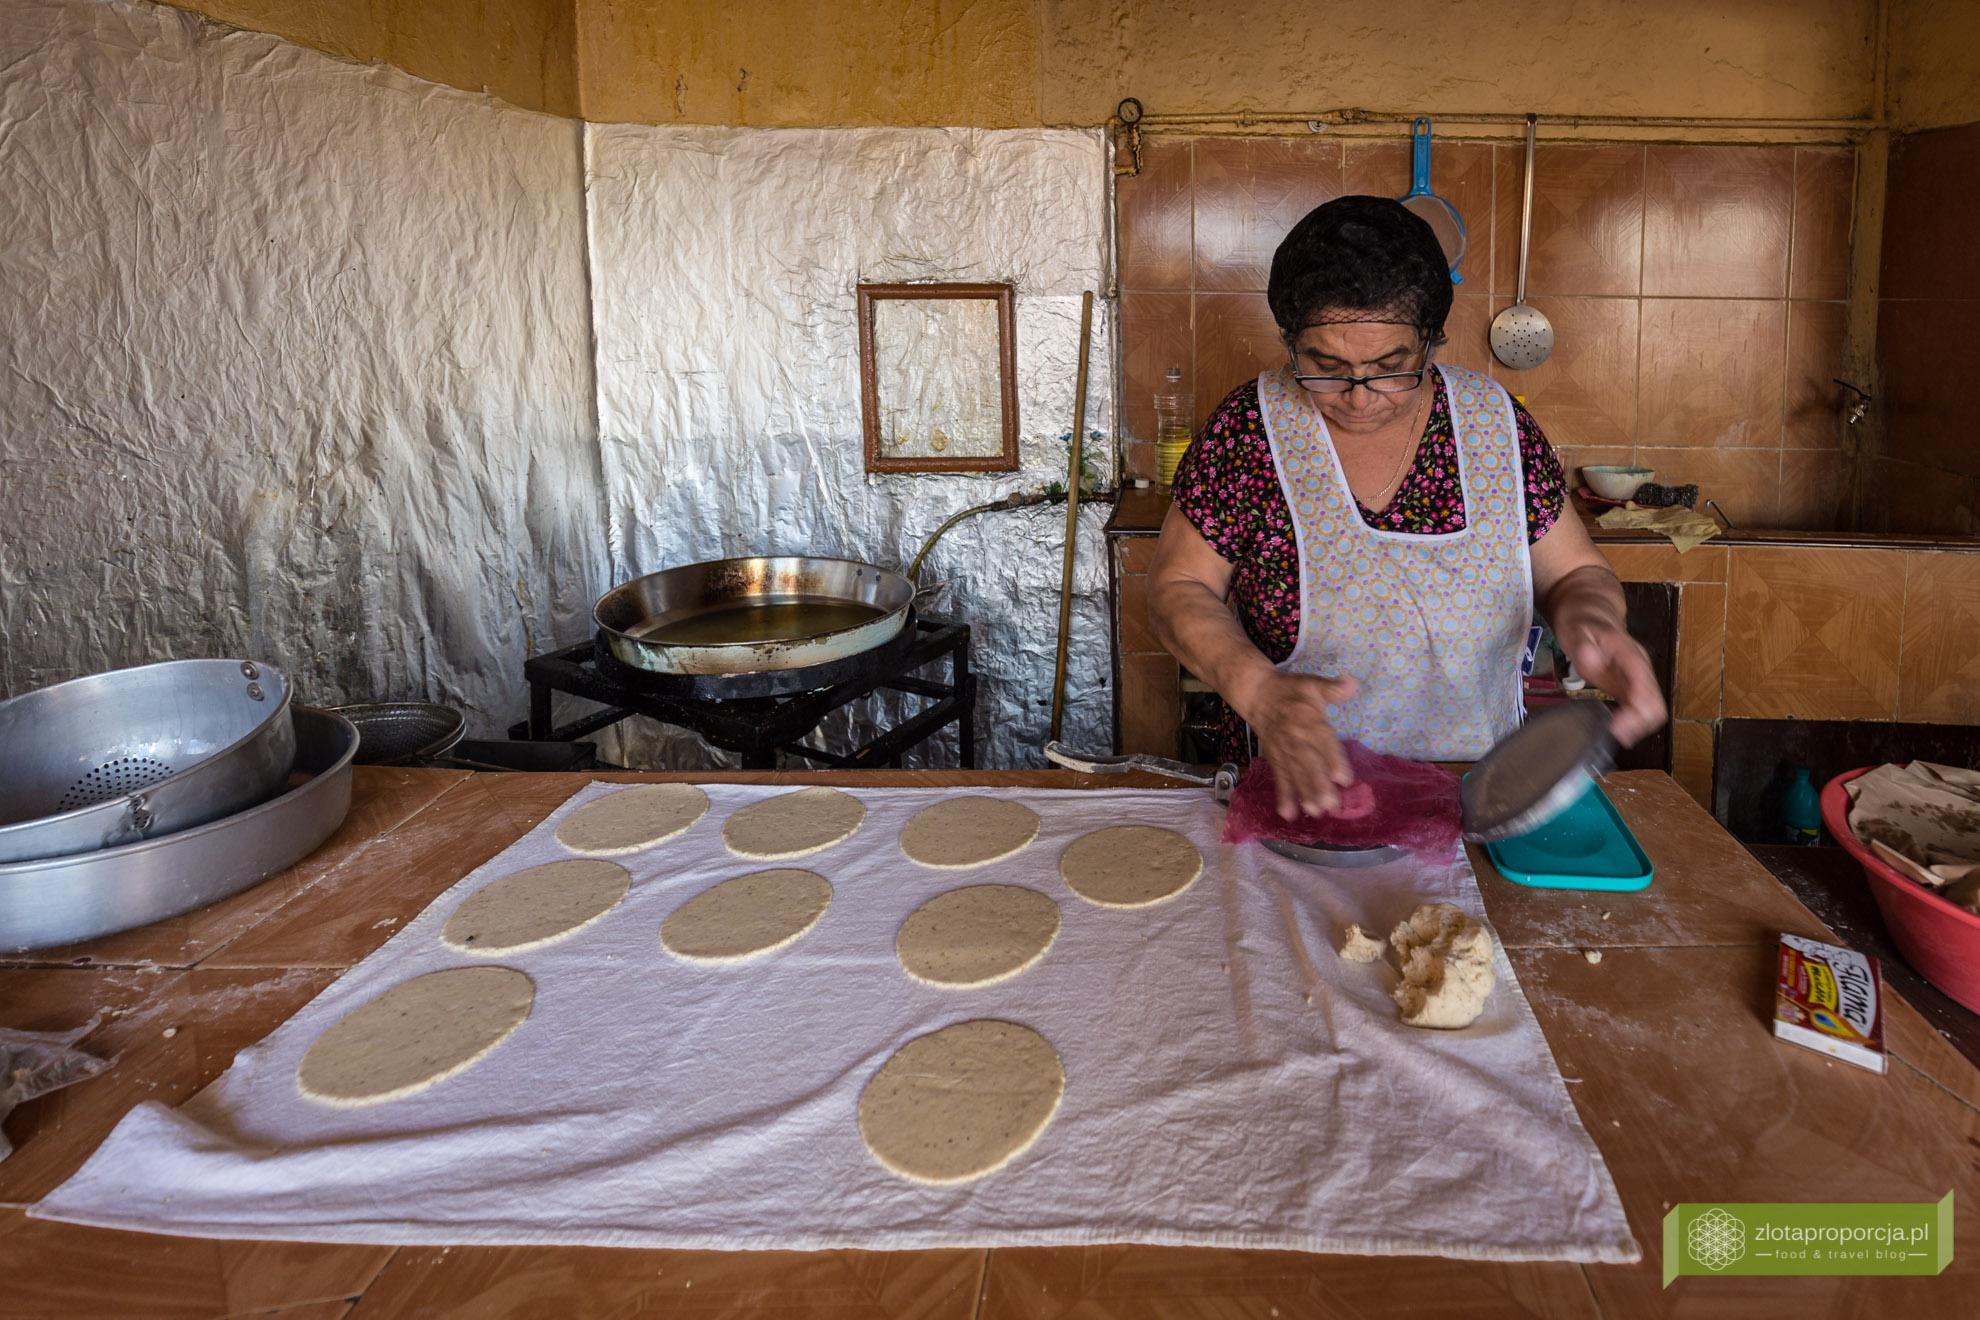 kuchnia Jukatanu, kuchnia meksykańska, meksykańskie potrawy, potrawy na Jukatanie, meksykański street food, panuchos